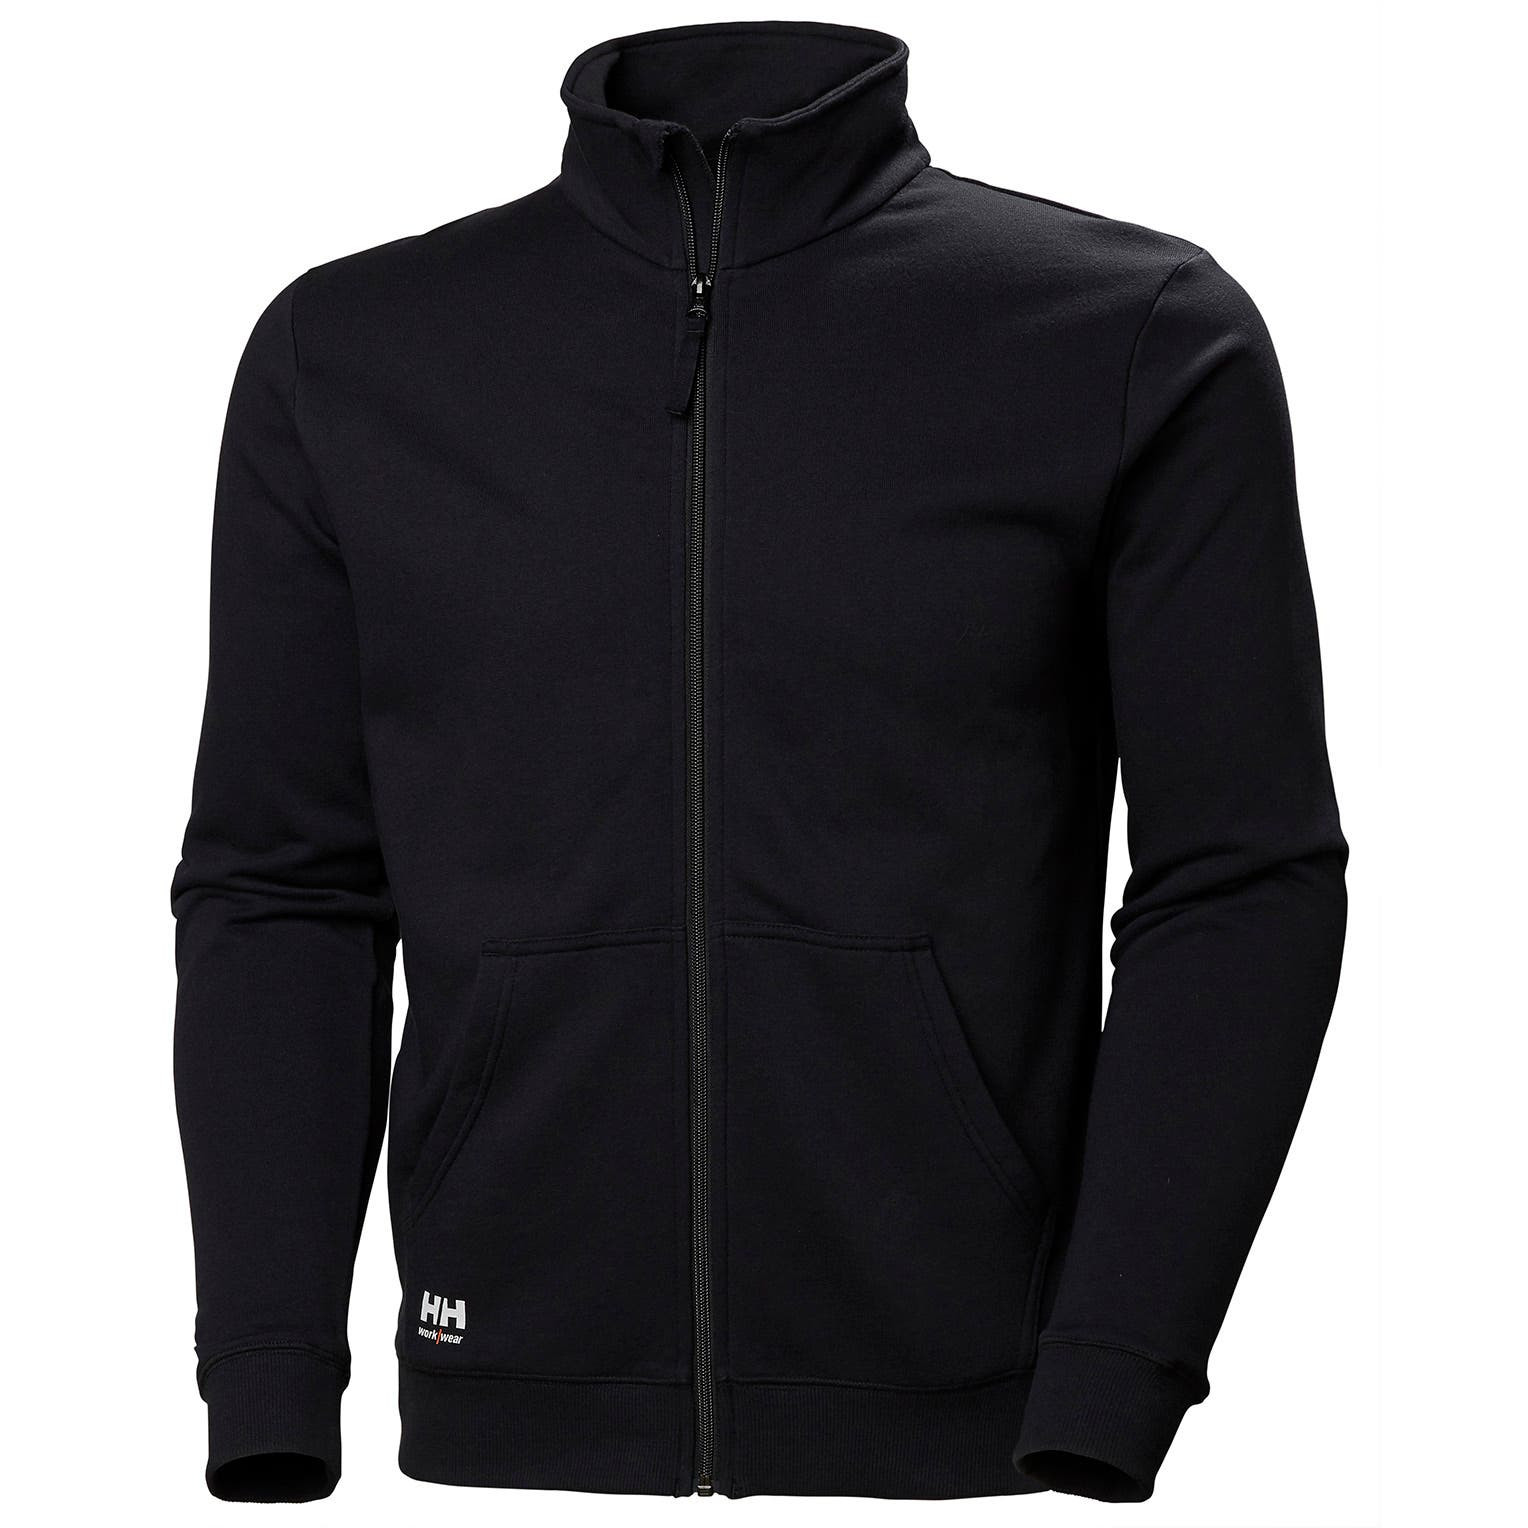 Свитшот на молнии Helly Hansen Manchester Zip Sweatshirt - 79212 (Black; M)